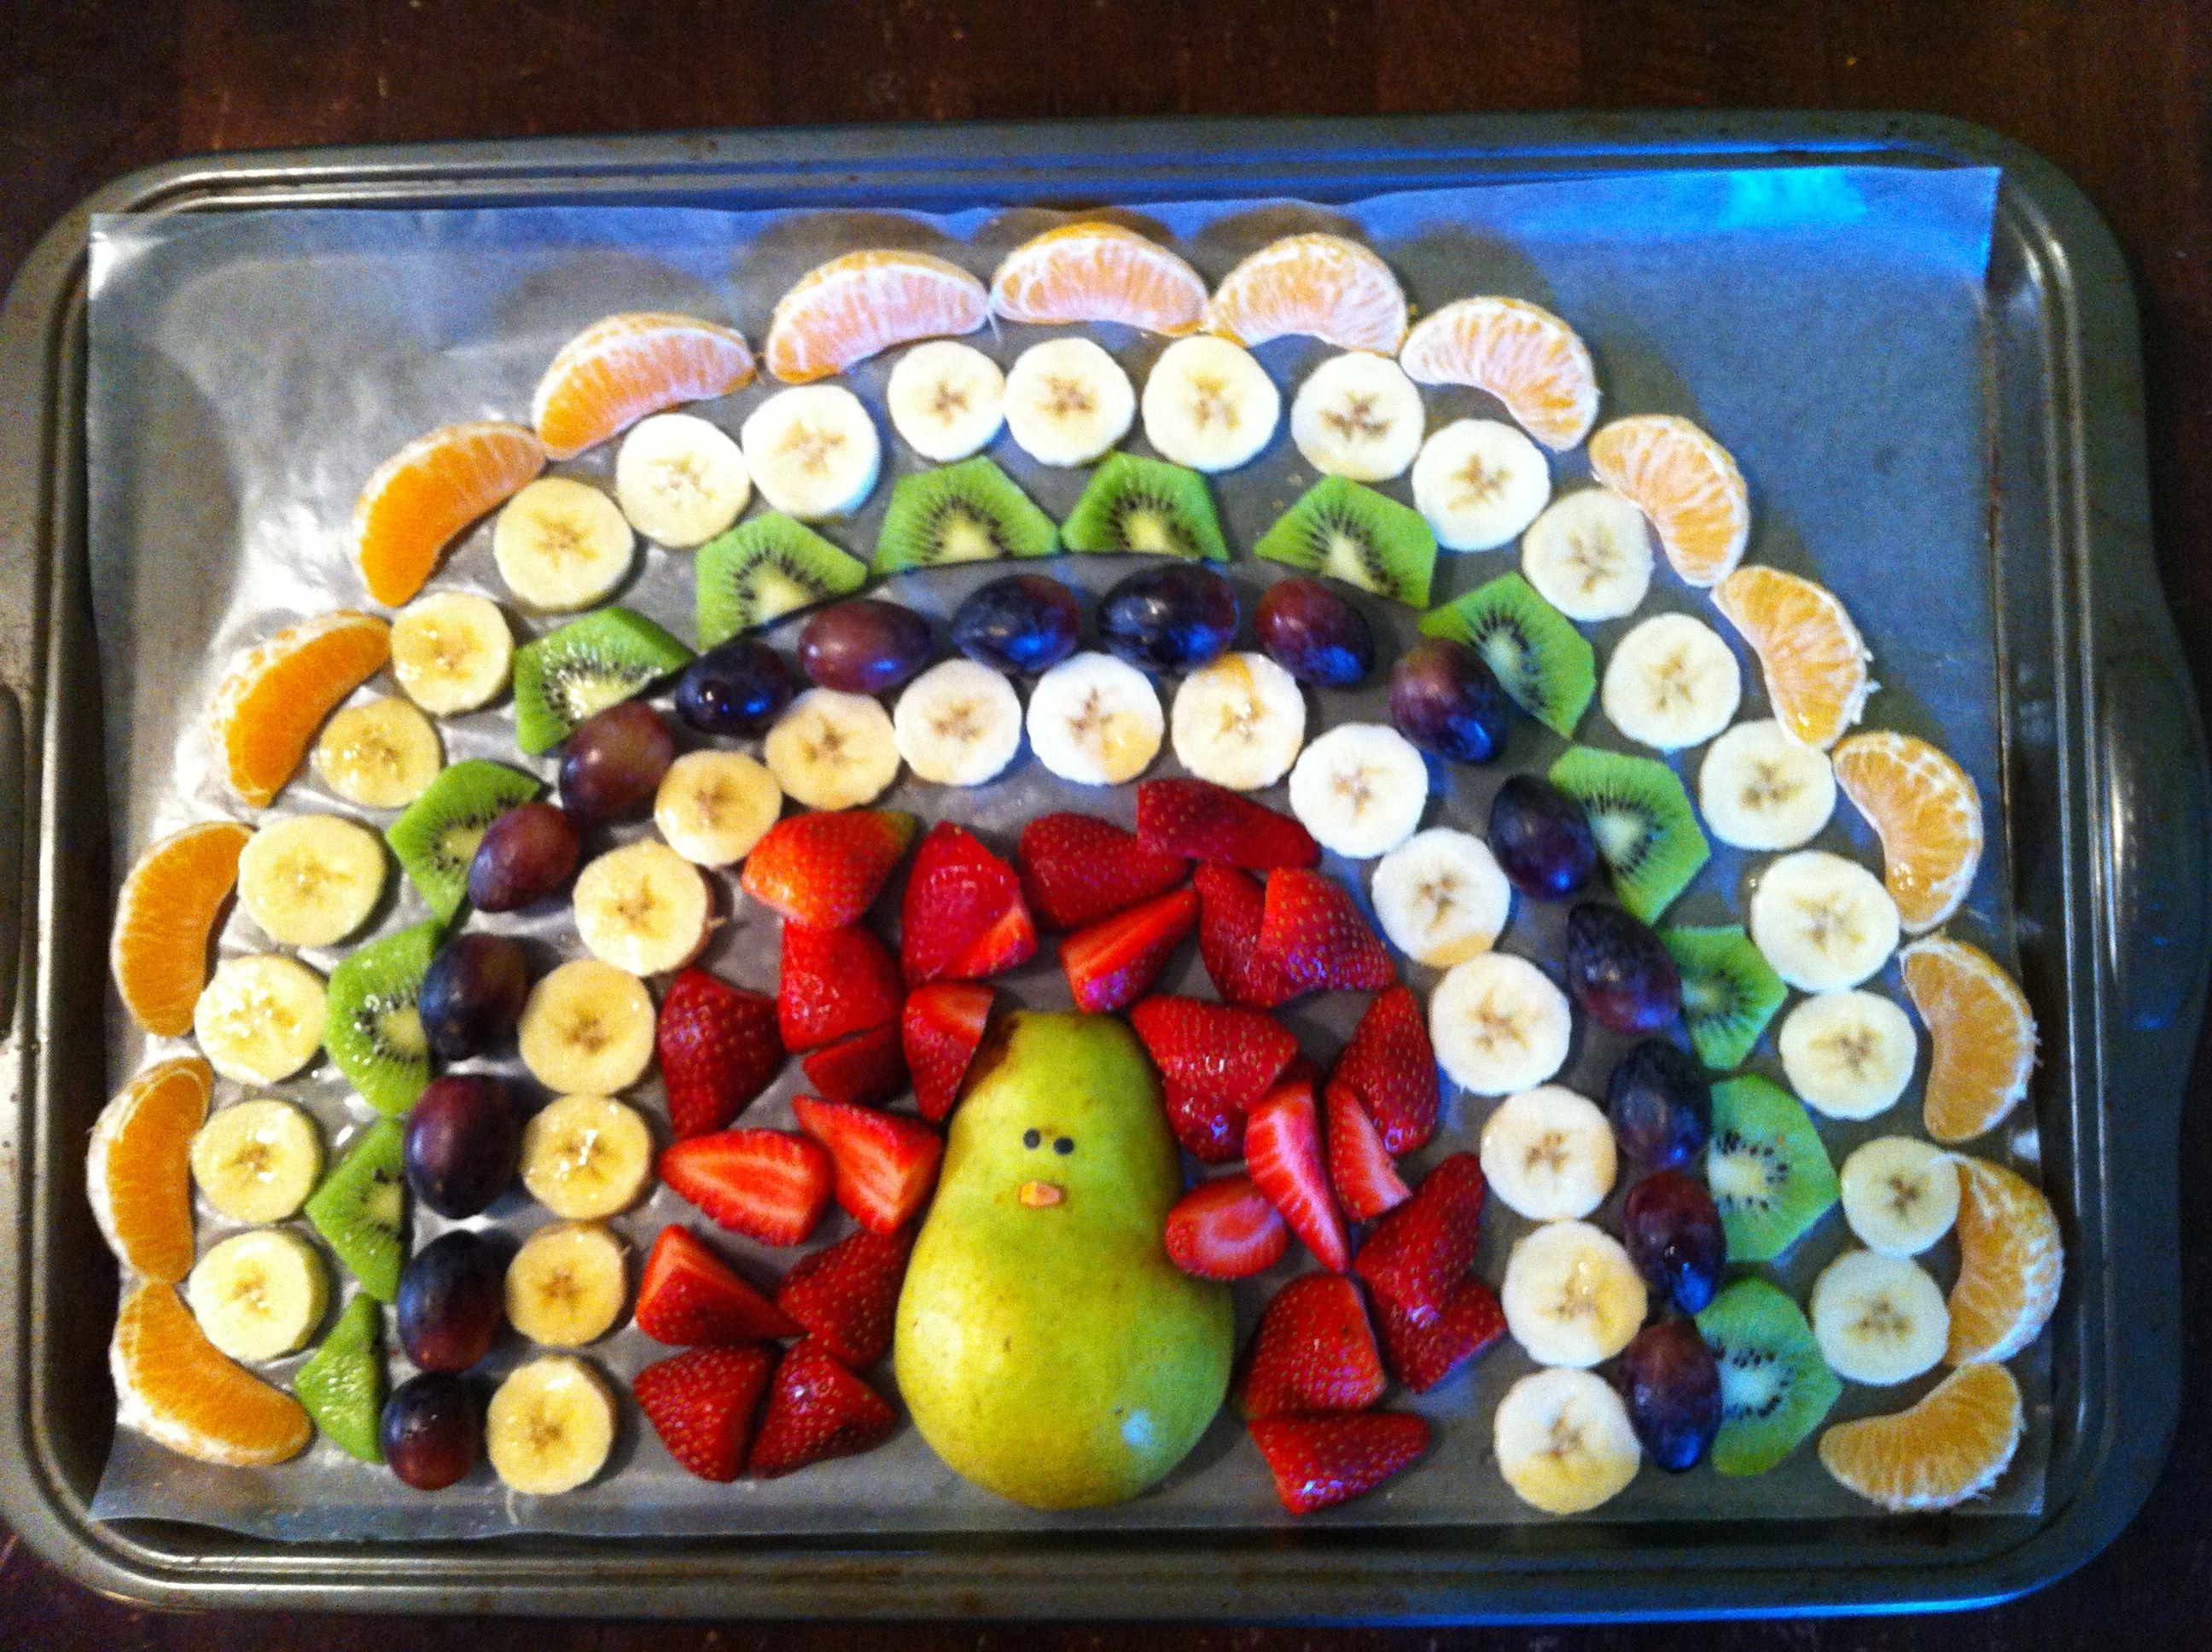 Turkey Day Preschool Style